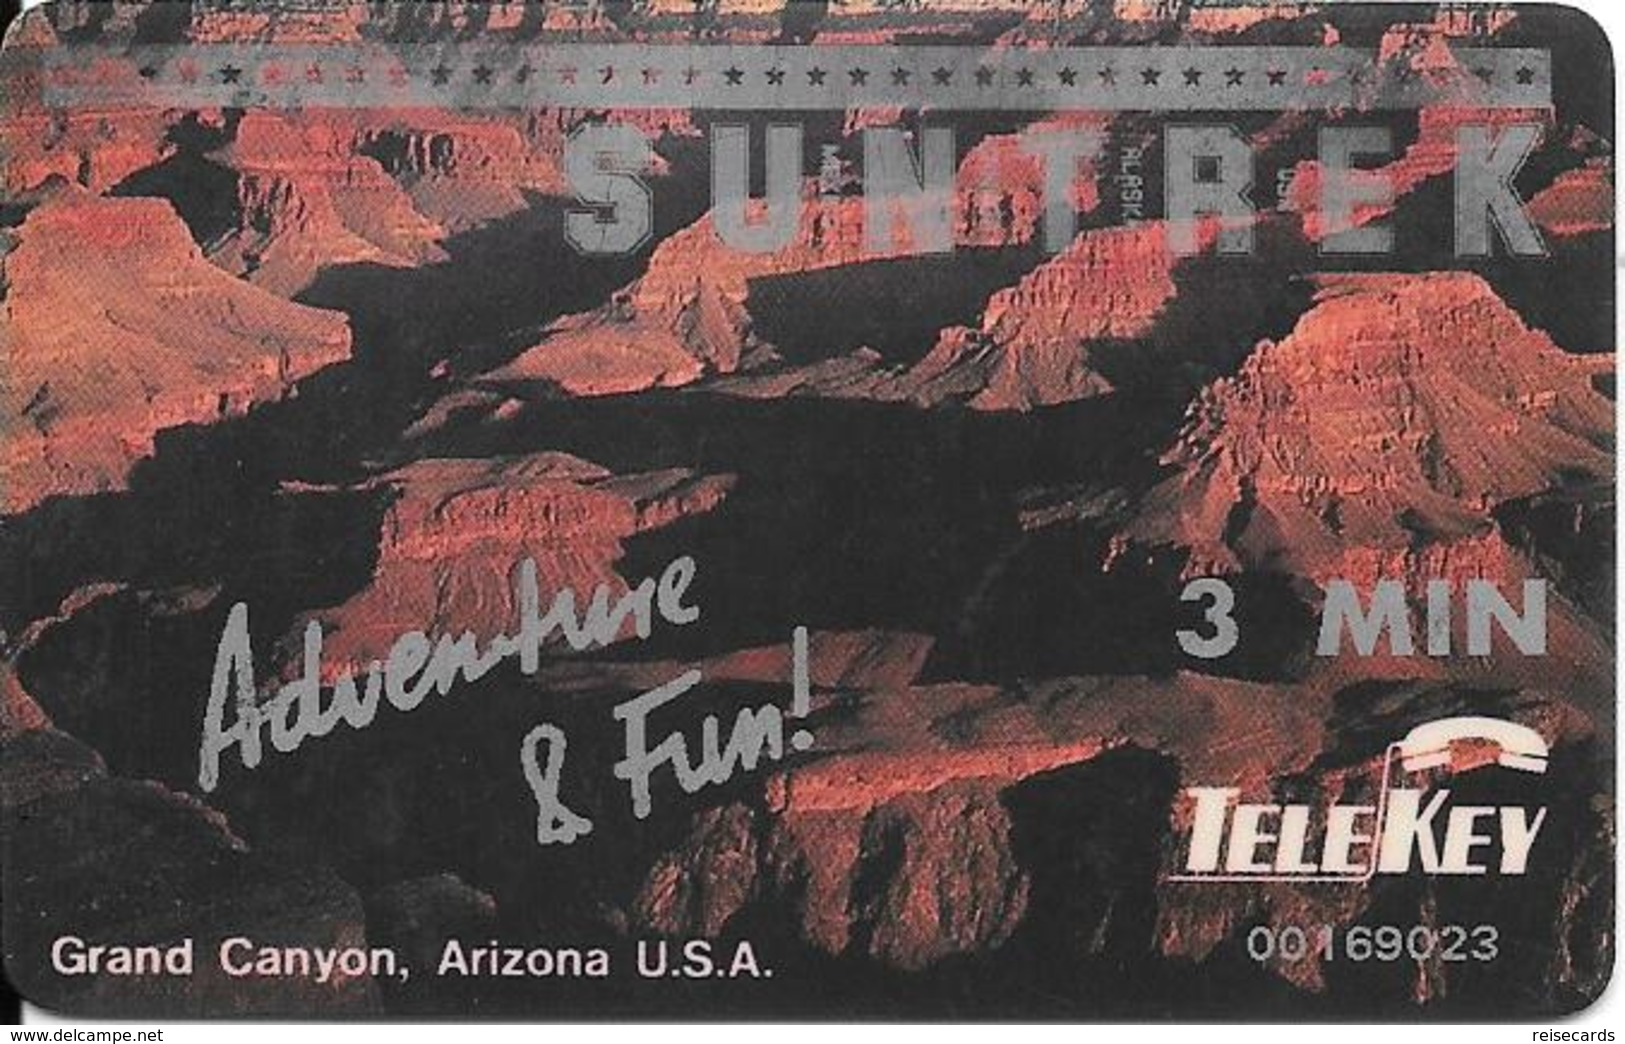 TeleKey: Suntrek - Grand Canyon, Arizona - Sonstige